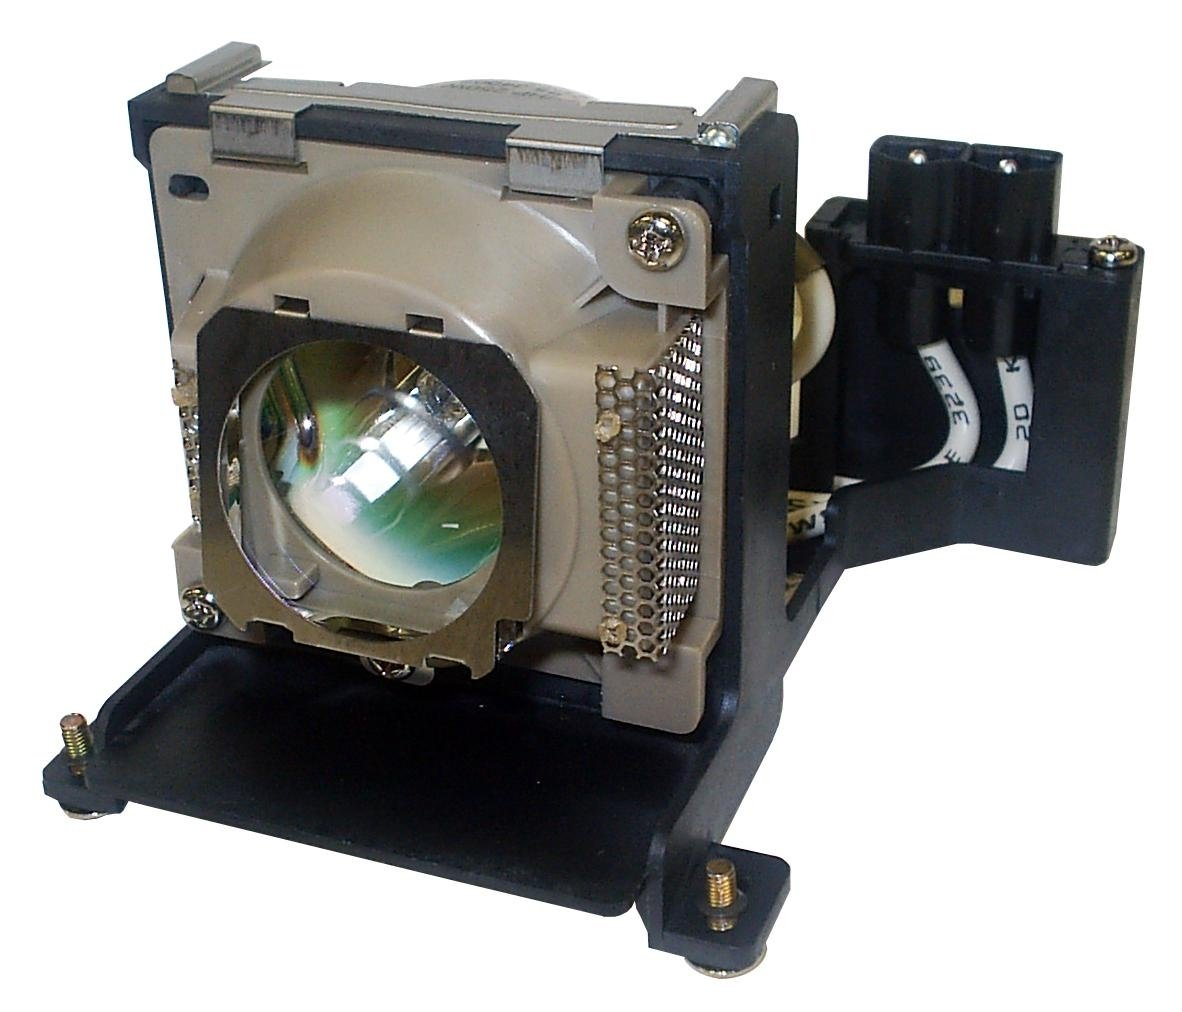 Amazon.com: BenQ Replacement Lamp for SP920P 5J.J2D05.001: Office ...